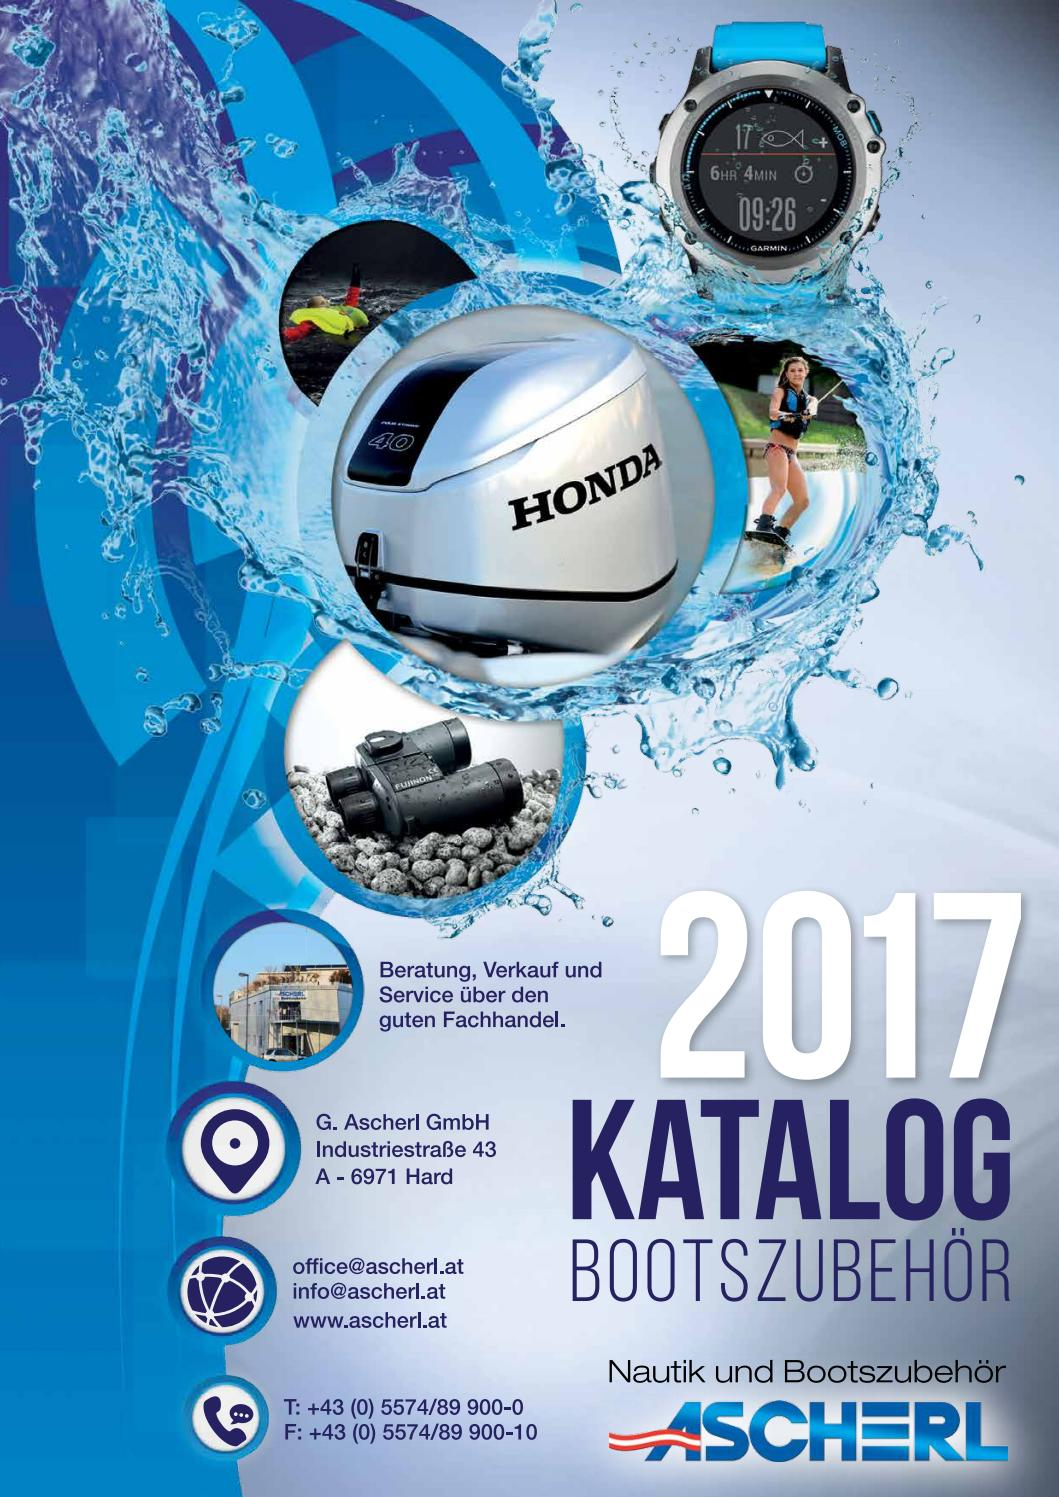 Katalog2017 web by Ascherl GmbH issuu